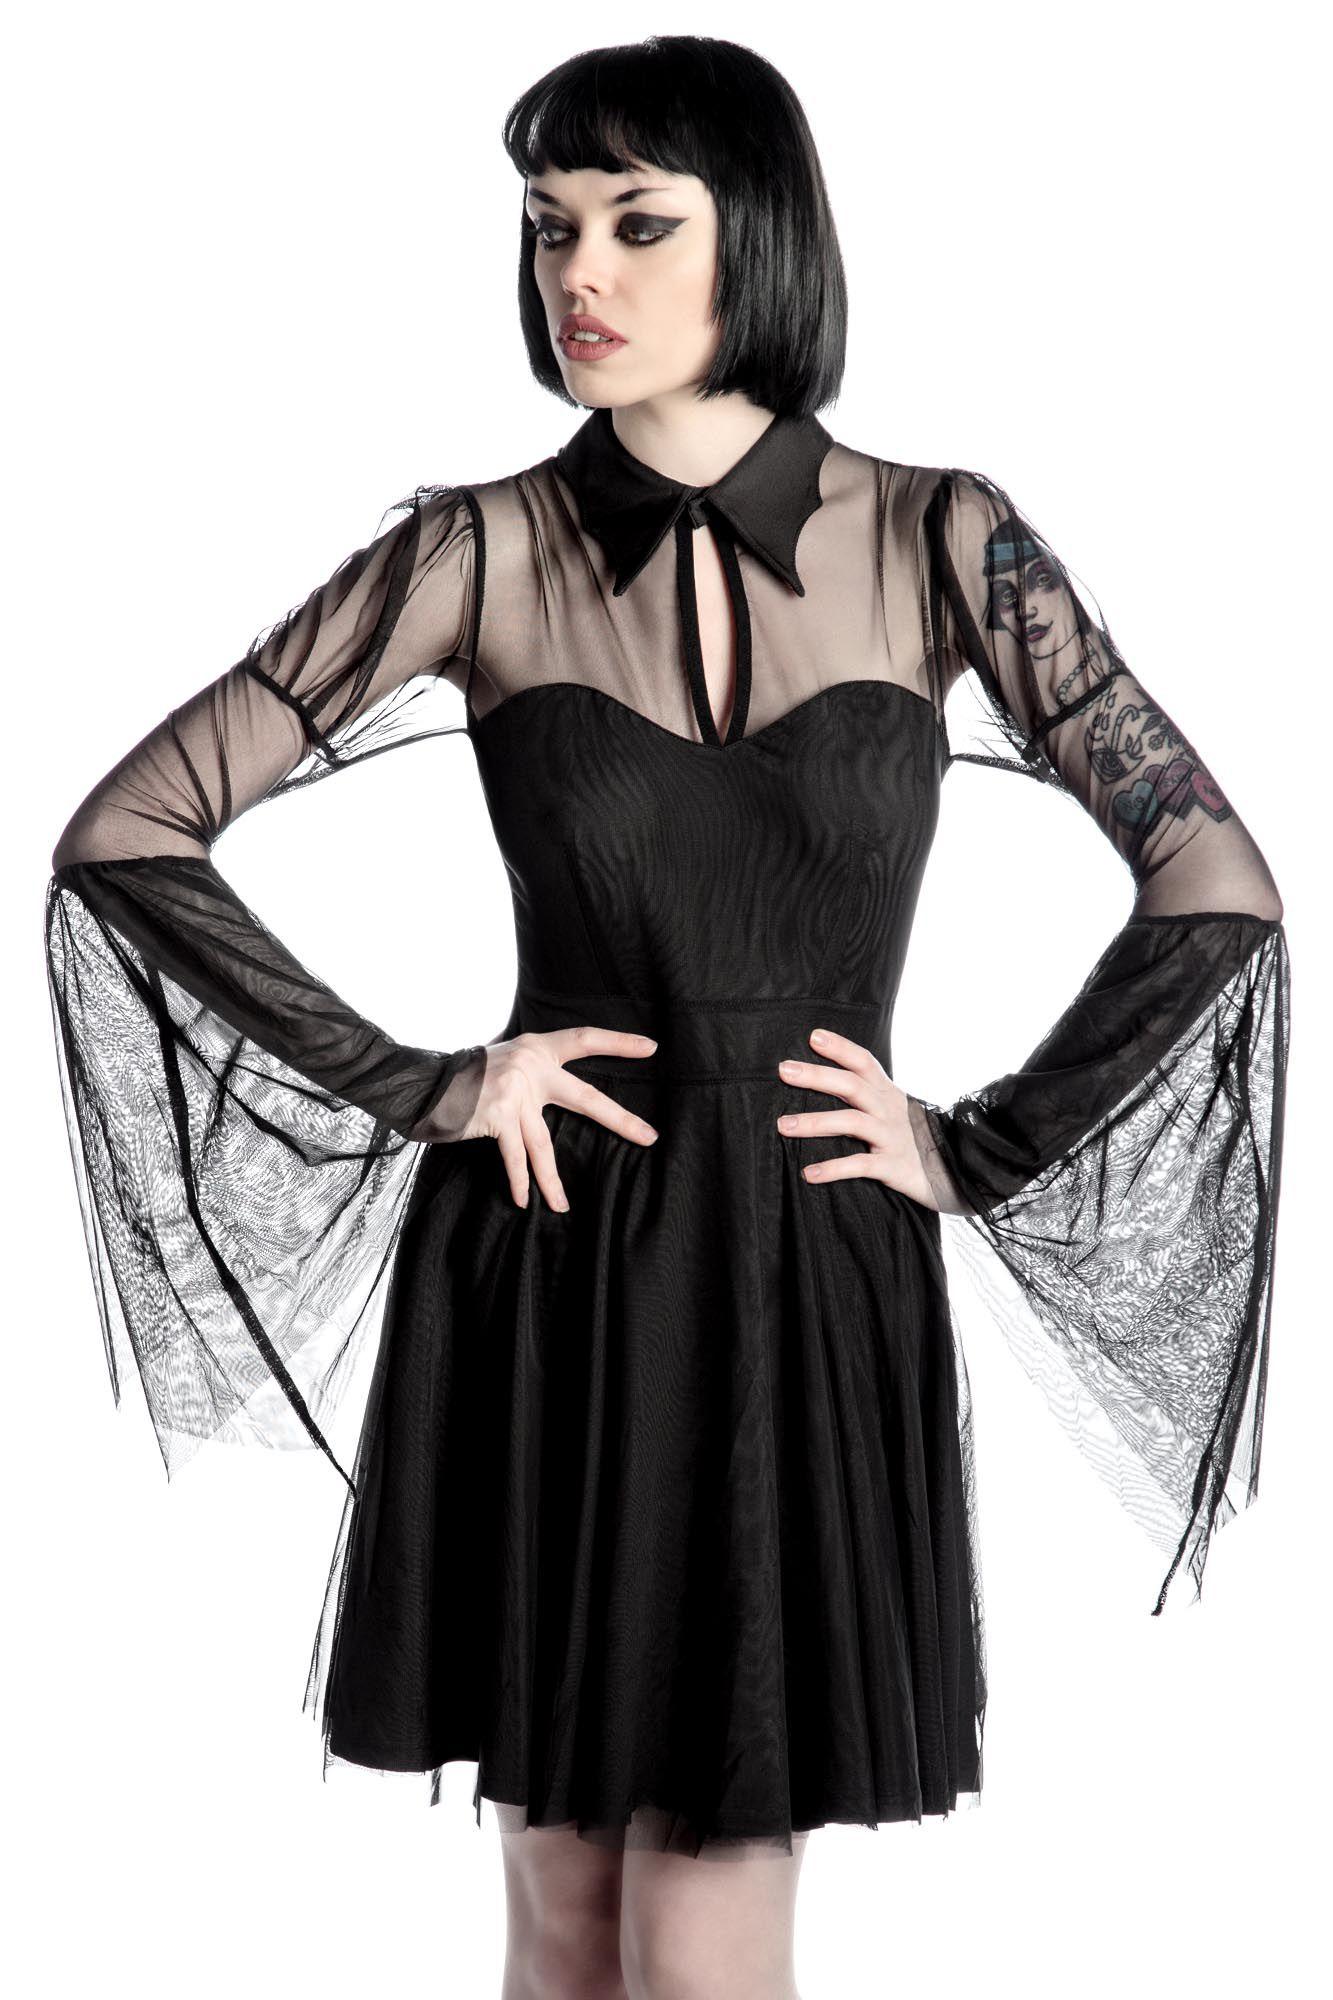 ks2344_mini-robe_gothique_glam_rock_bound-by-blood